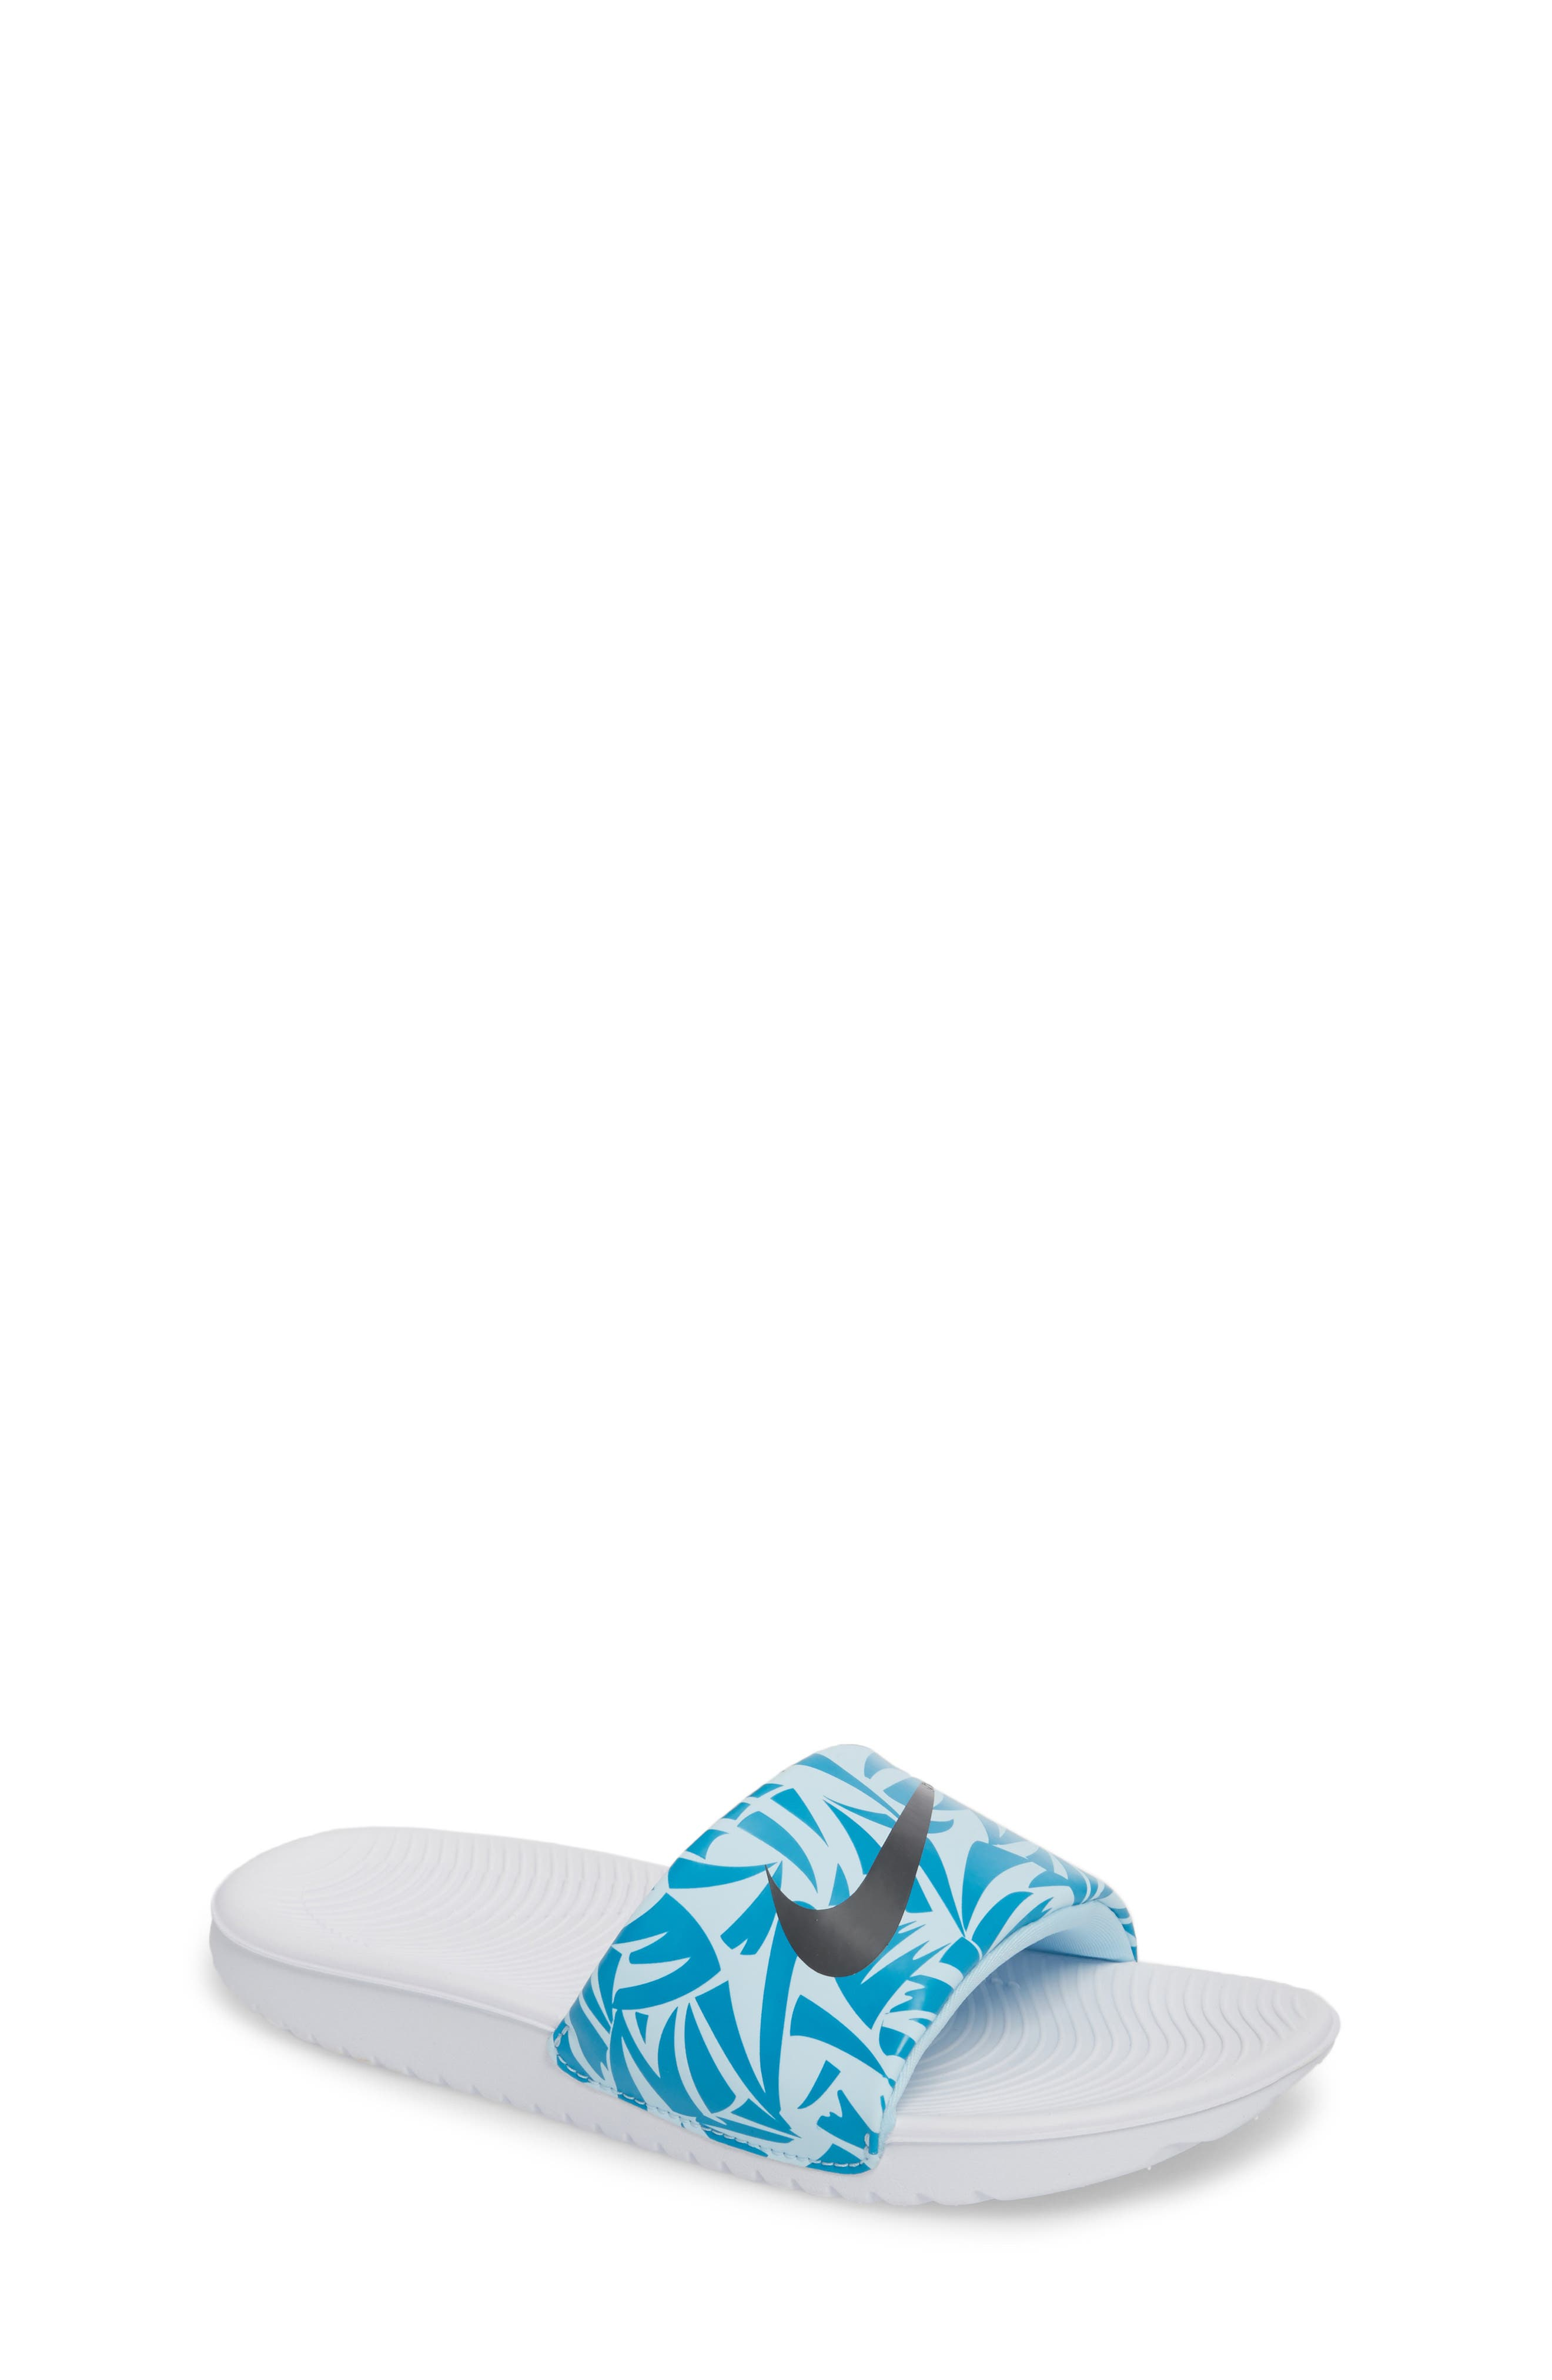 'Kawa' Print Slide Sandal,                         Main,                         color, White/ Anthracite/ Turquoise